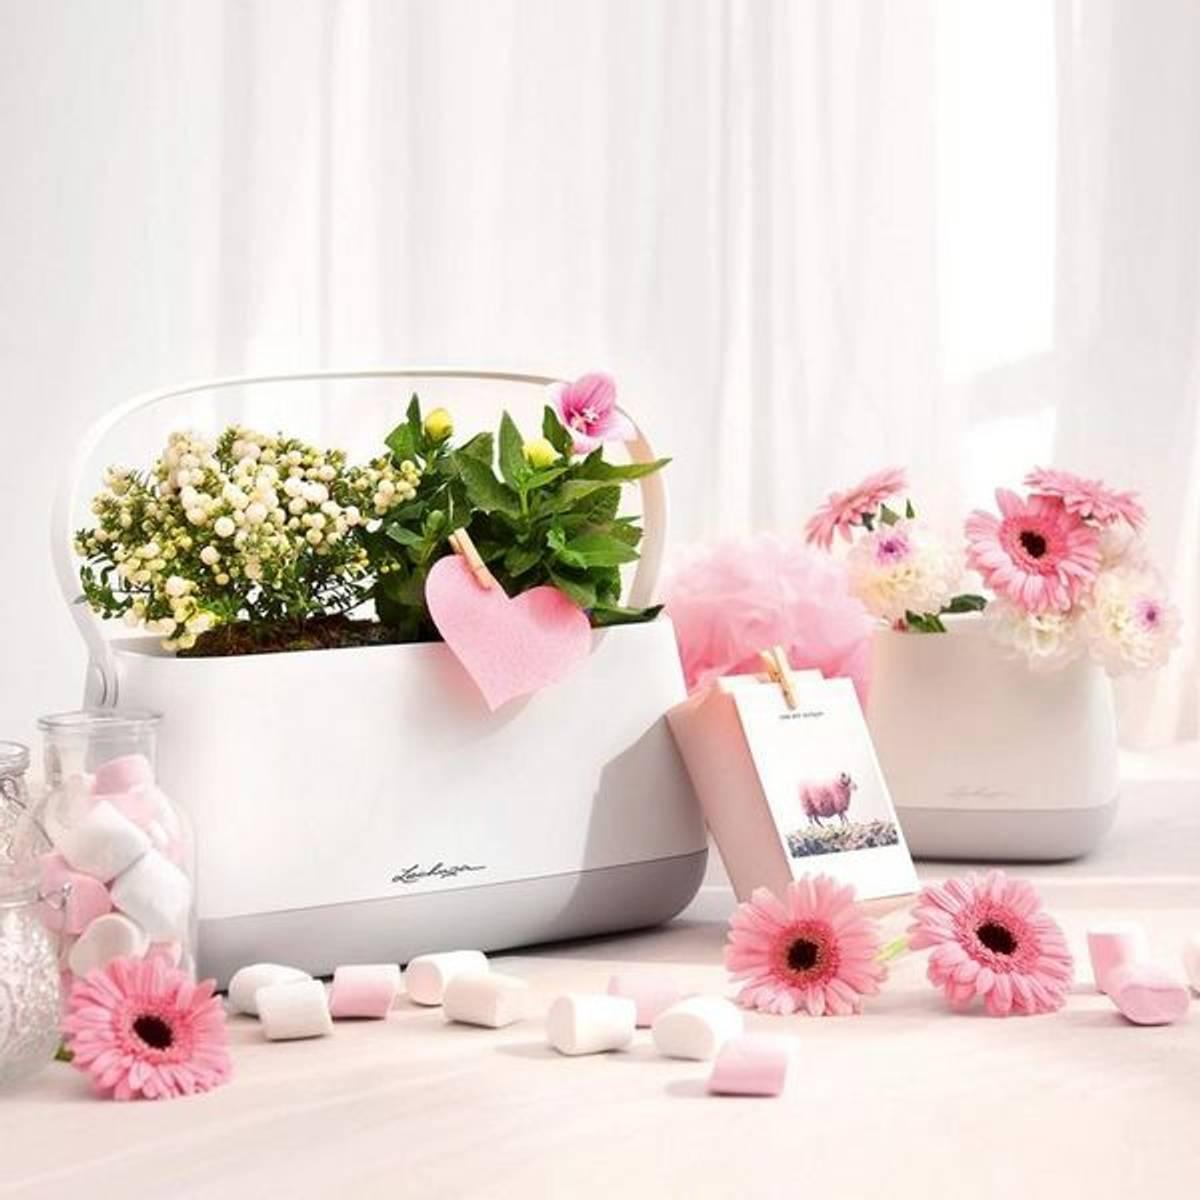 YULA Plant Bag 'White/Pearl Rose' Lechuza blomsterkasse